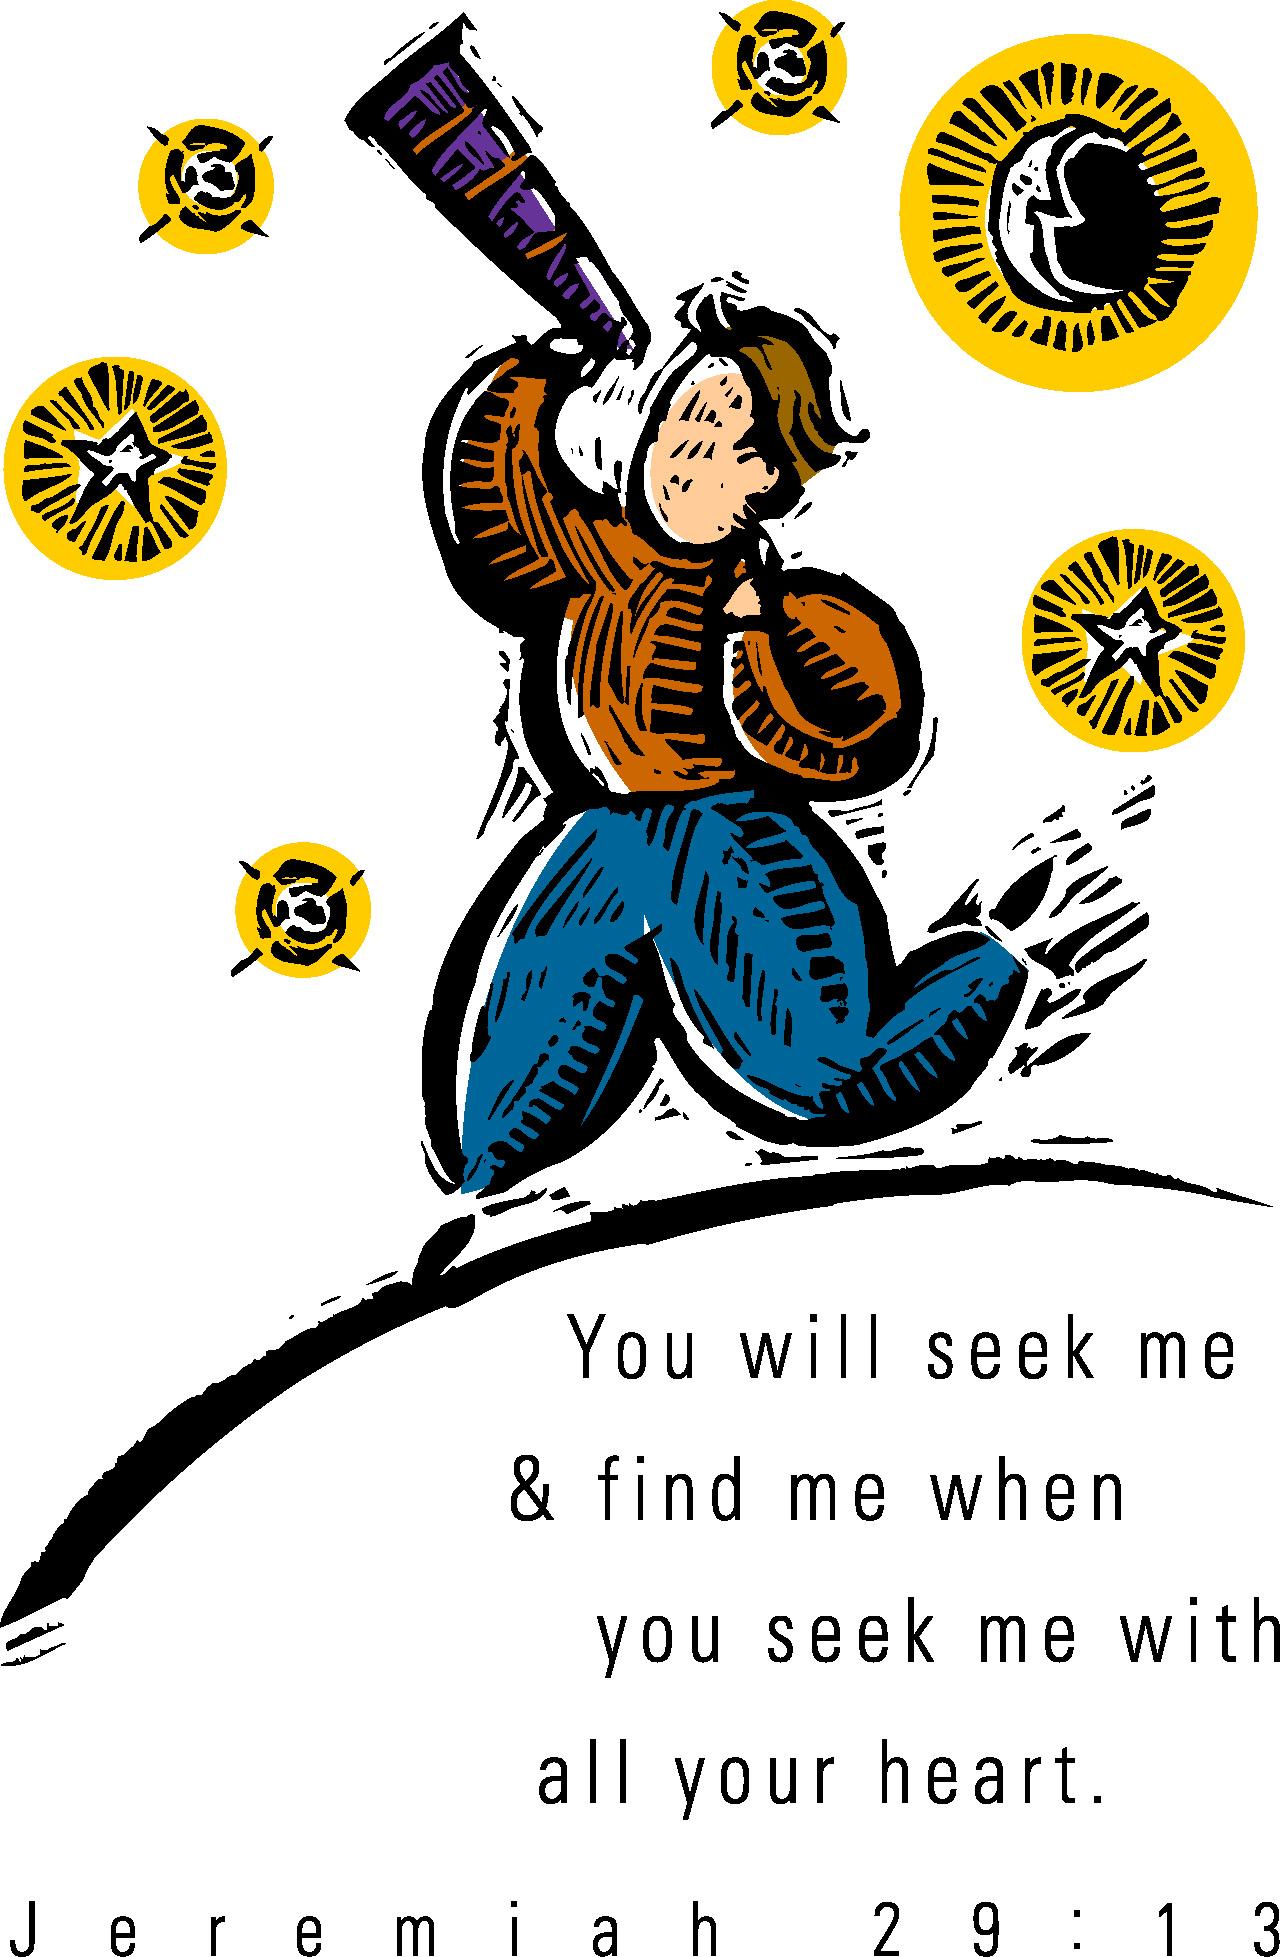 4catholiceducators com scripture clipart 5 rh 4catholiceducators com scripture clip art for bulletins scripture clip art for new year